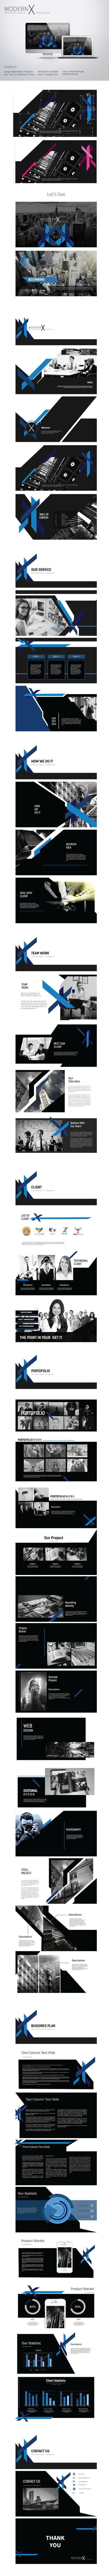 X-Modern PowerPoint Template - Business PowerPoint Templates